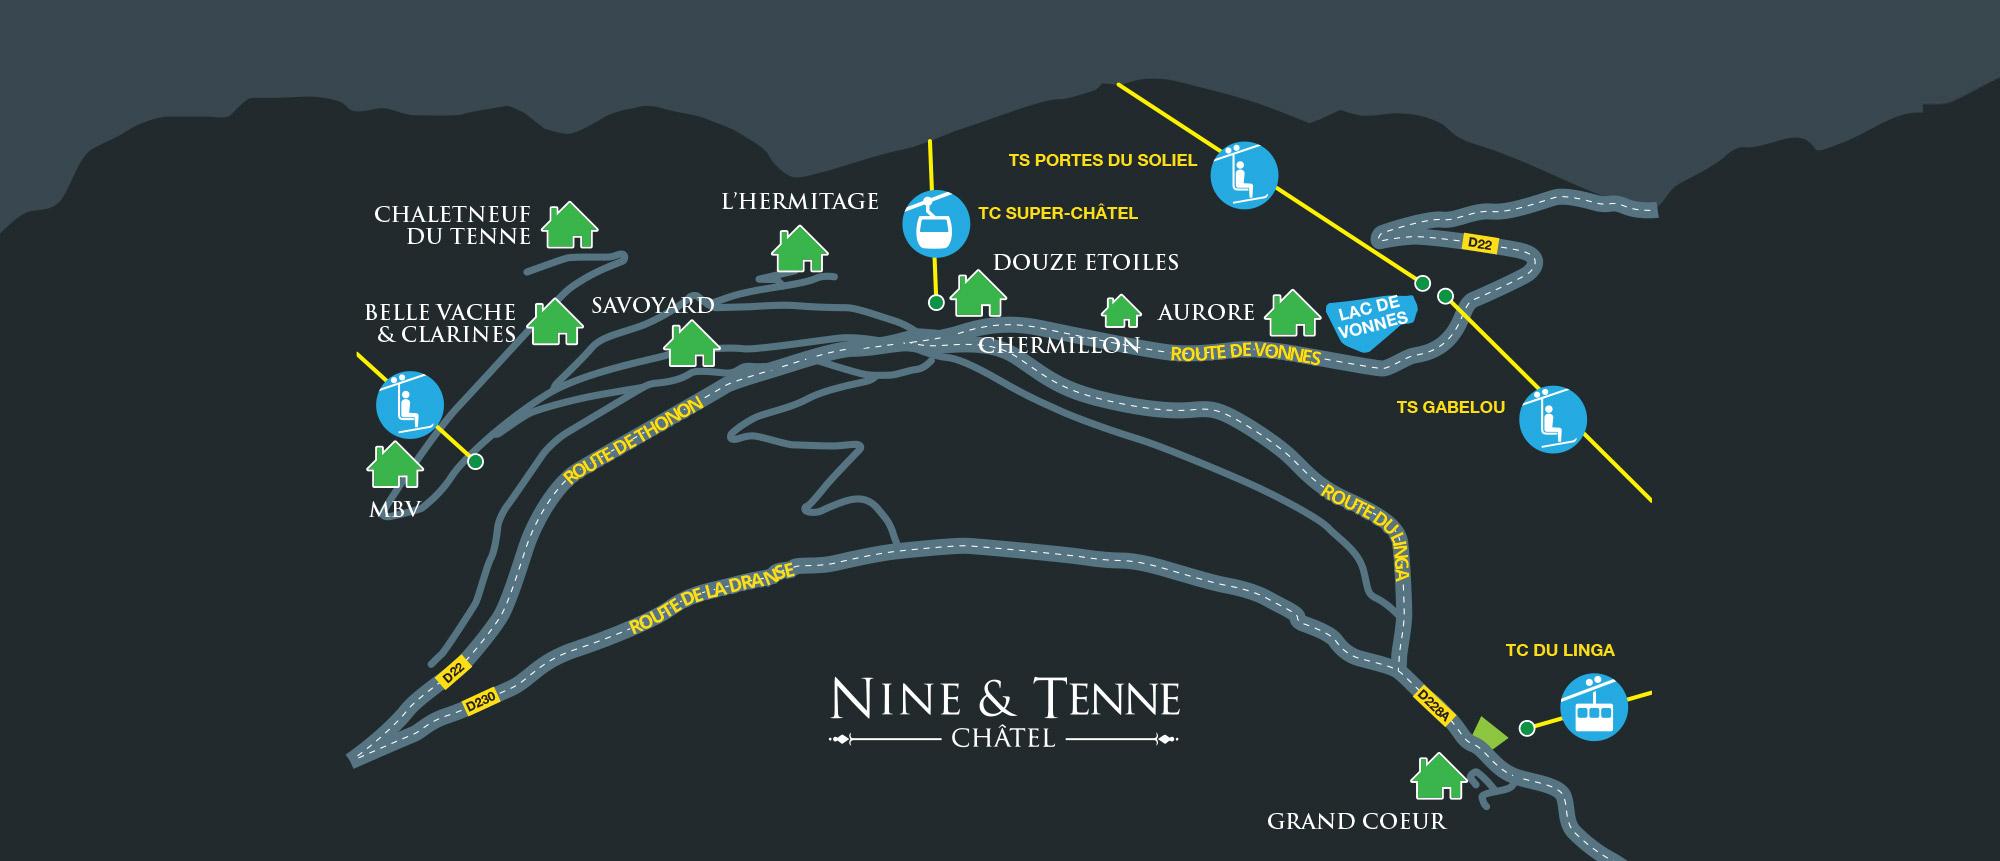 NINE & TENNE Map Chatel